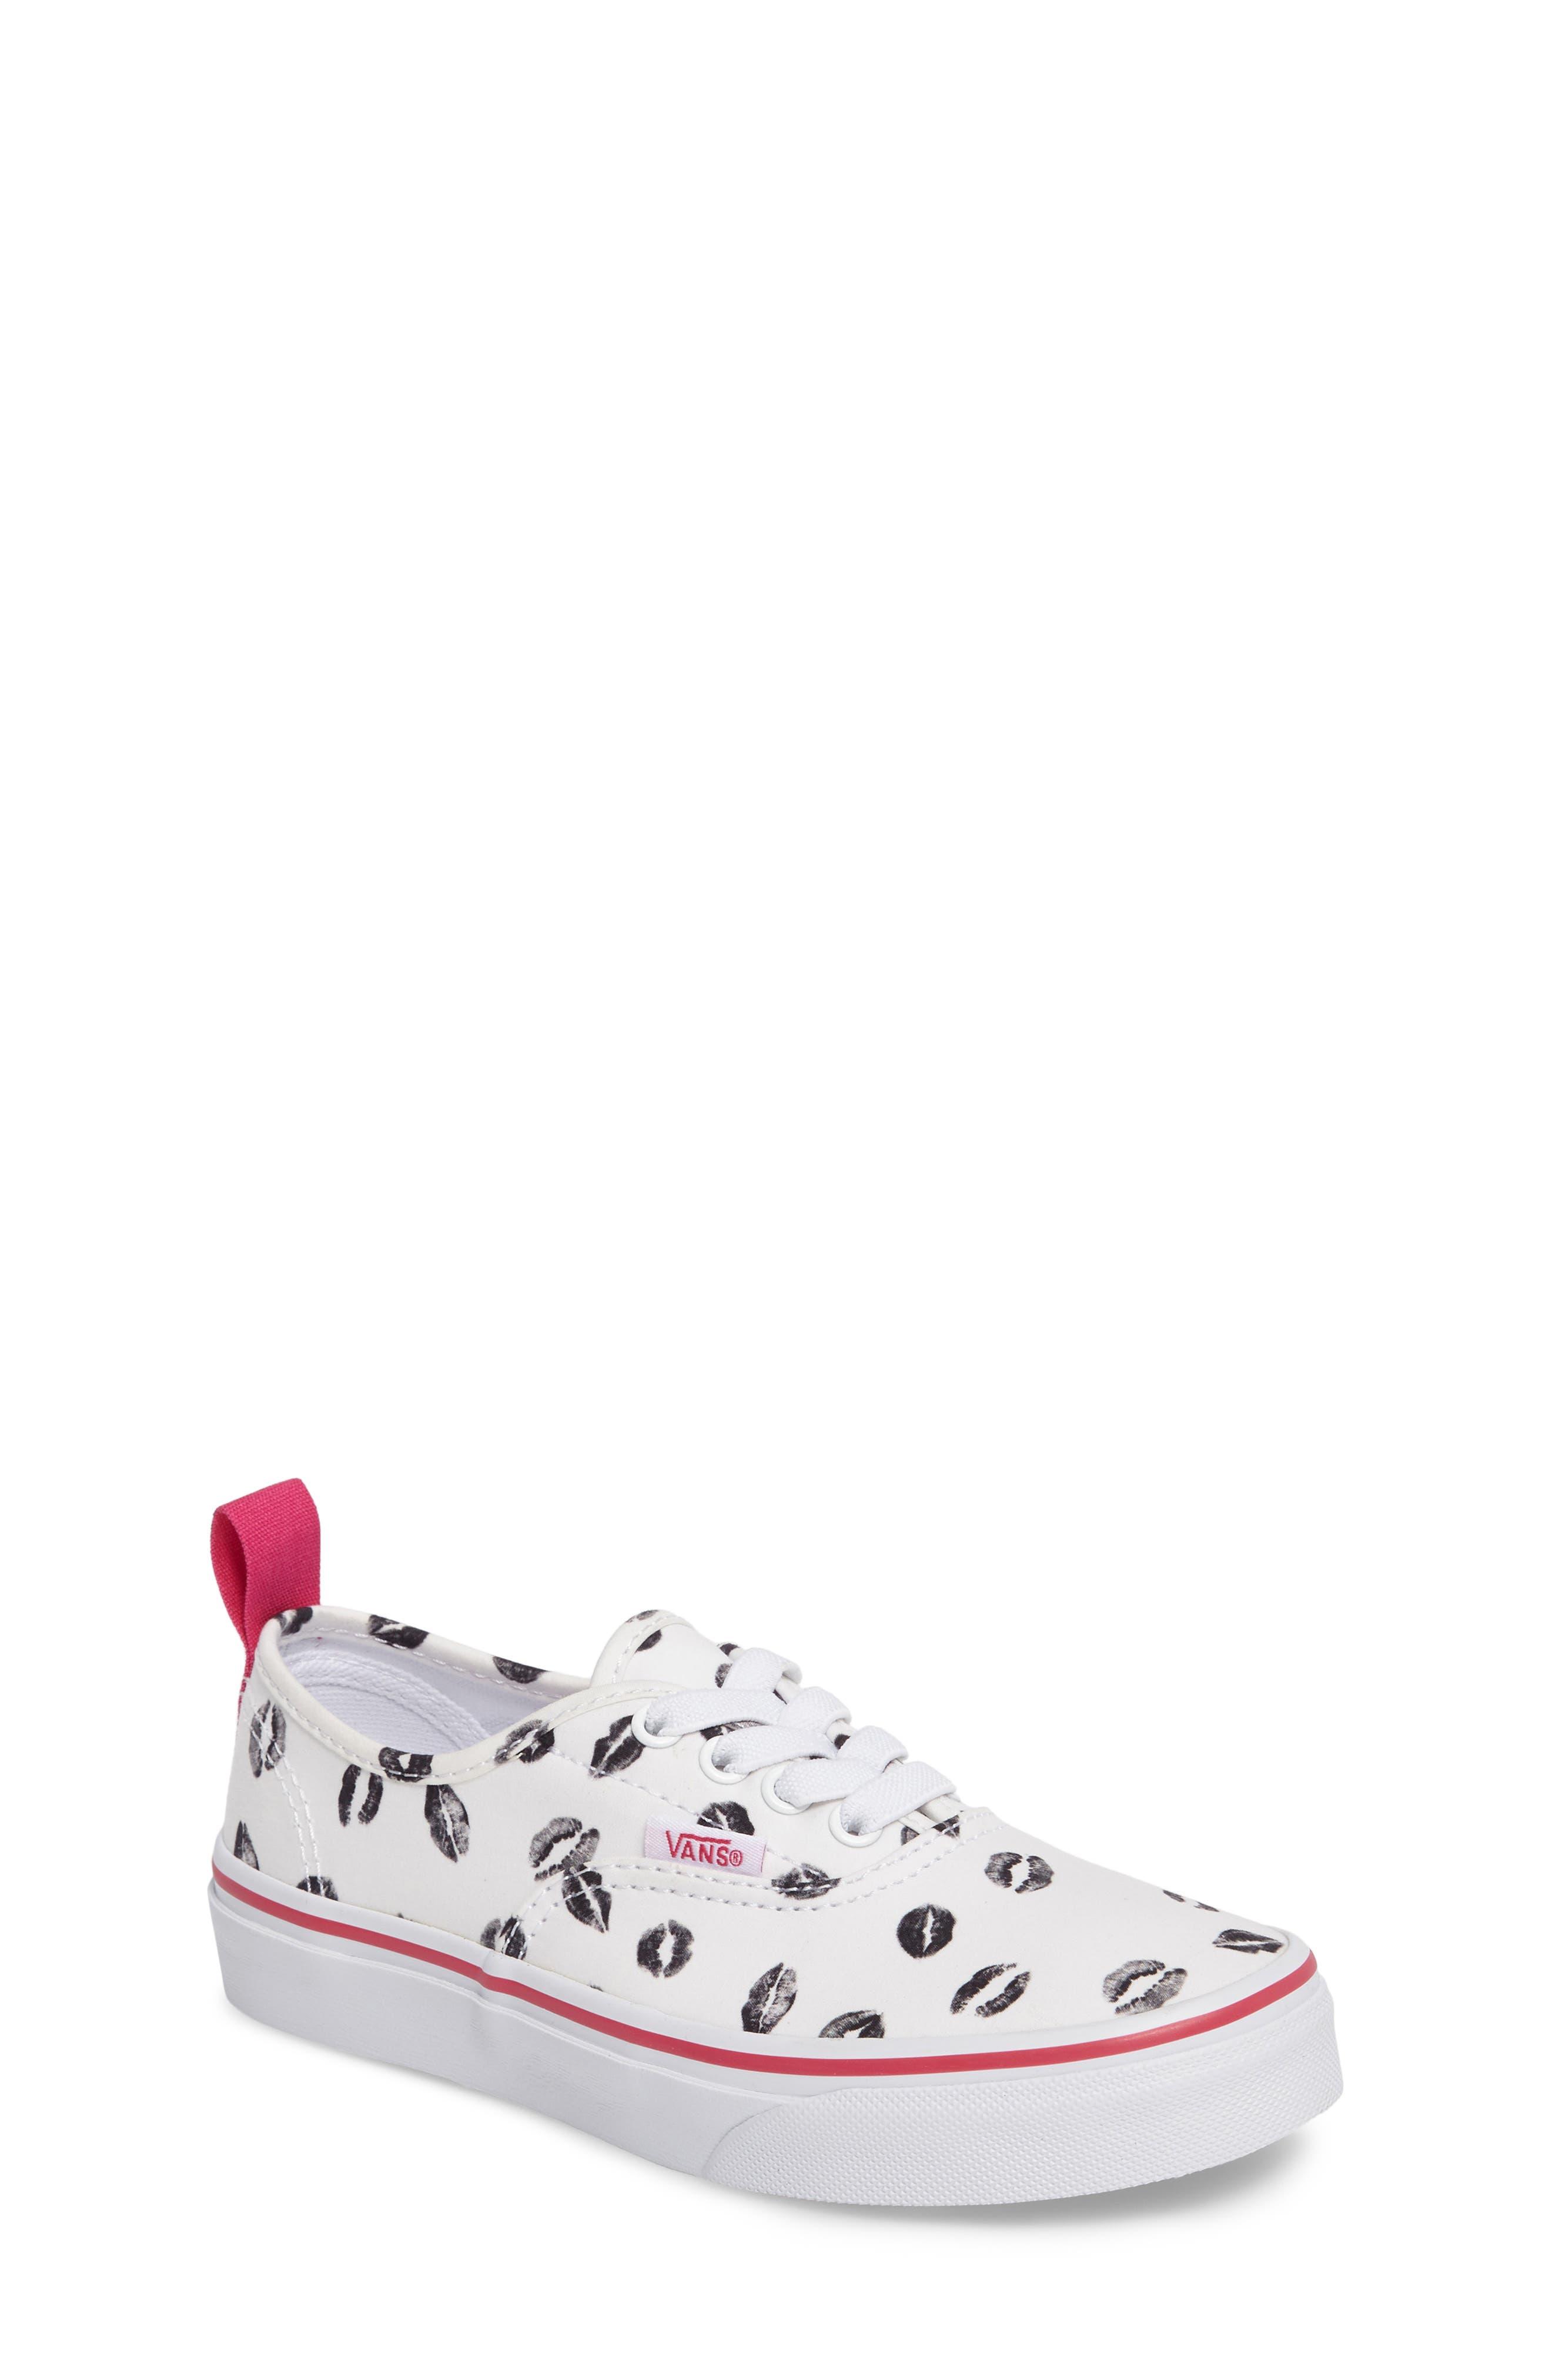 Vans Valentines Authentic Elastic Lace Sneaker (Toddler, Little Kid & Big Kid)